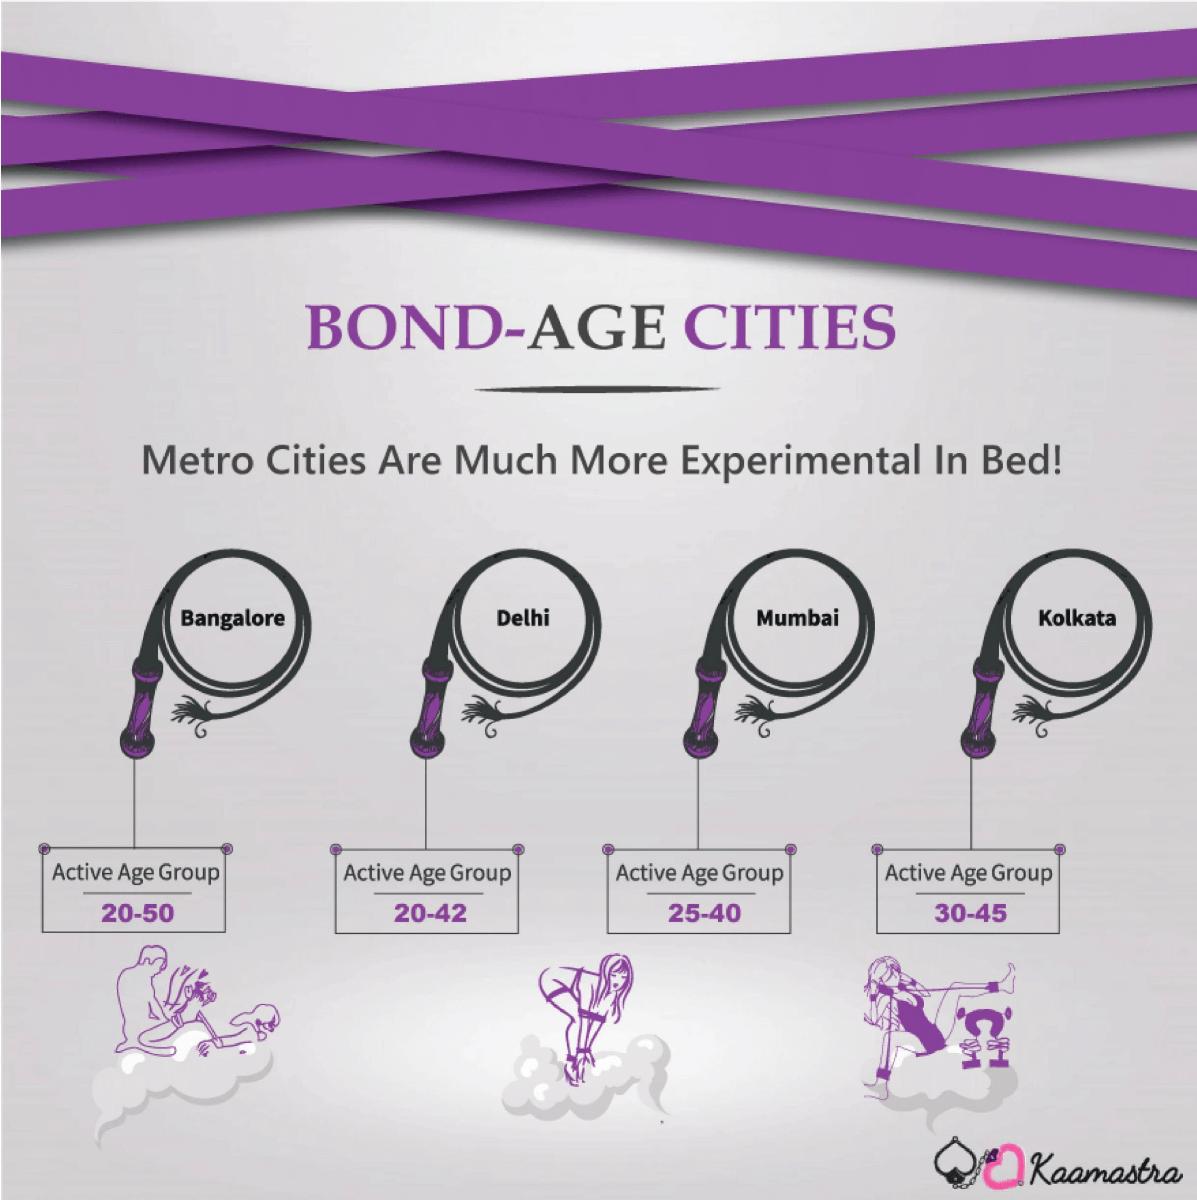 Bond-Age Cities